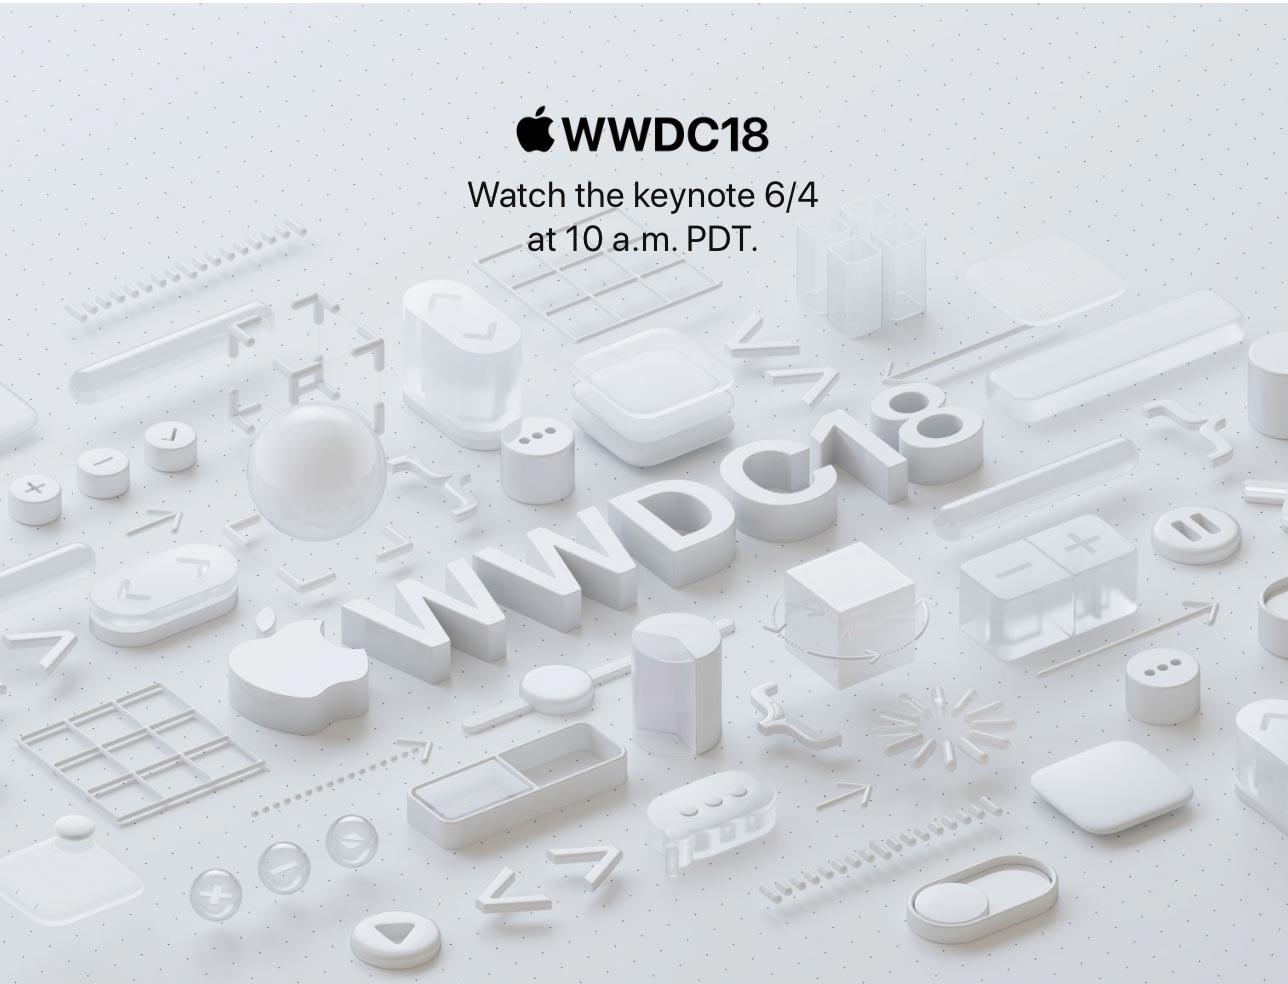 Apple、「WWDC 2018」の基調講演をライブストリーム配信すると発表 ― 日本時間6月5日午前2時から